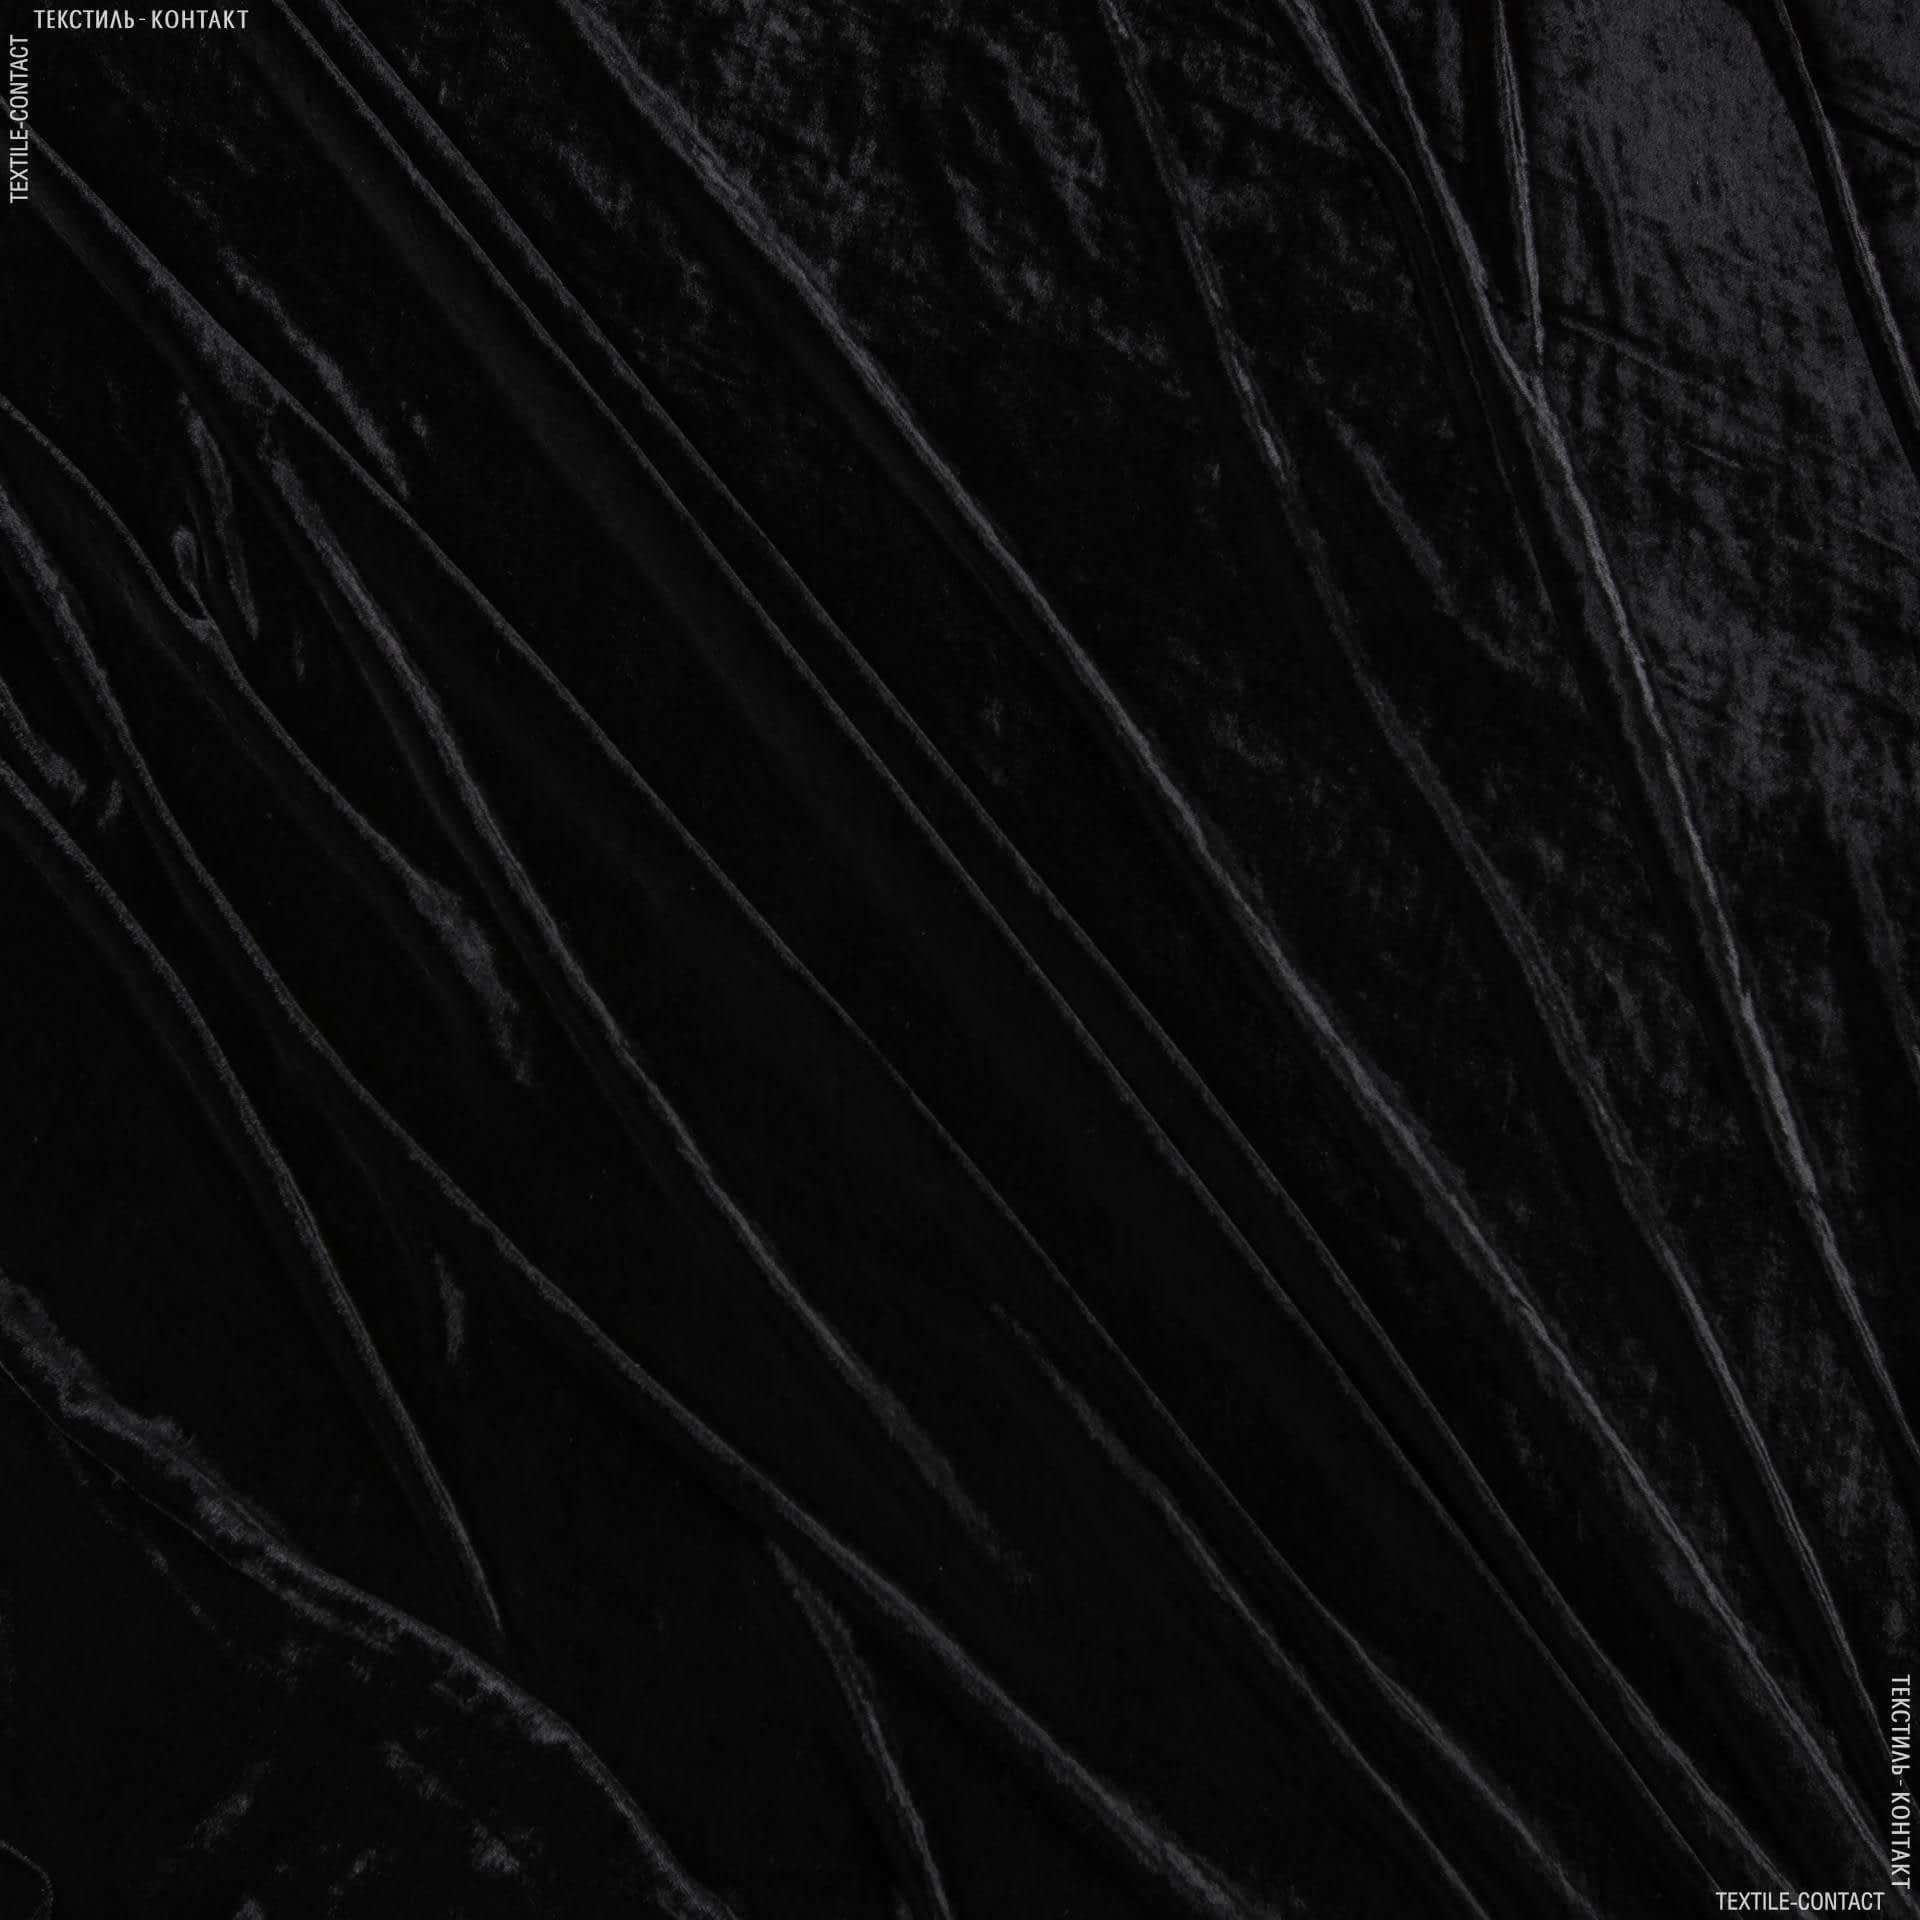 Ткани велюр/бархат - Бархат натуральный черный